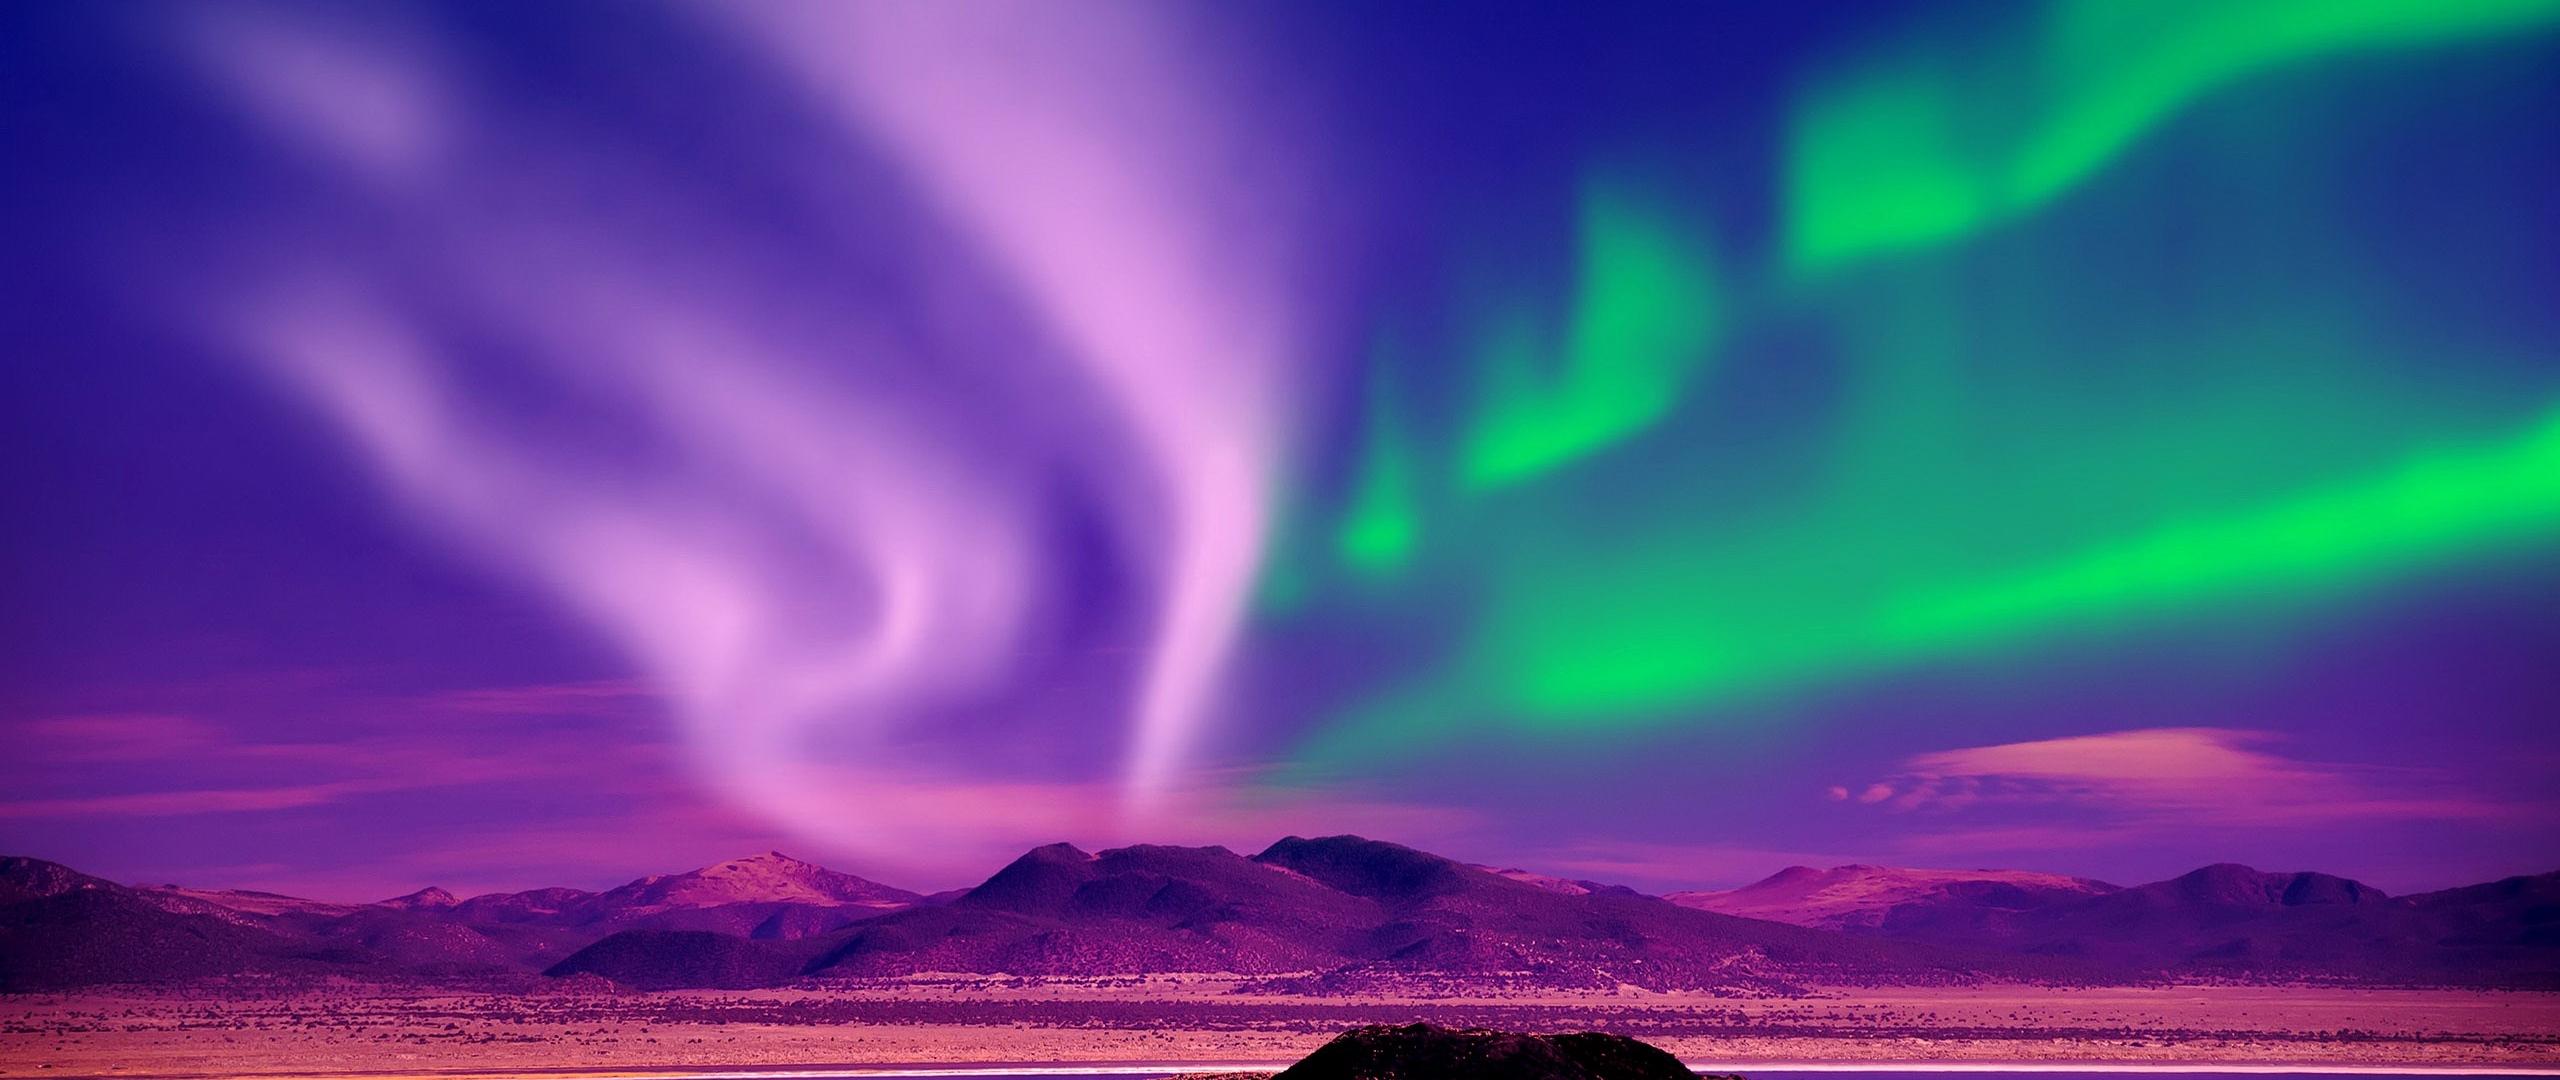 Aurora Borealis Canada  Full Hd 2k Wallpaper